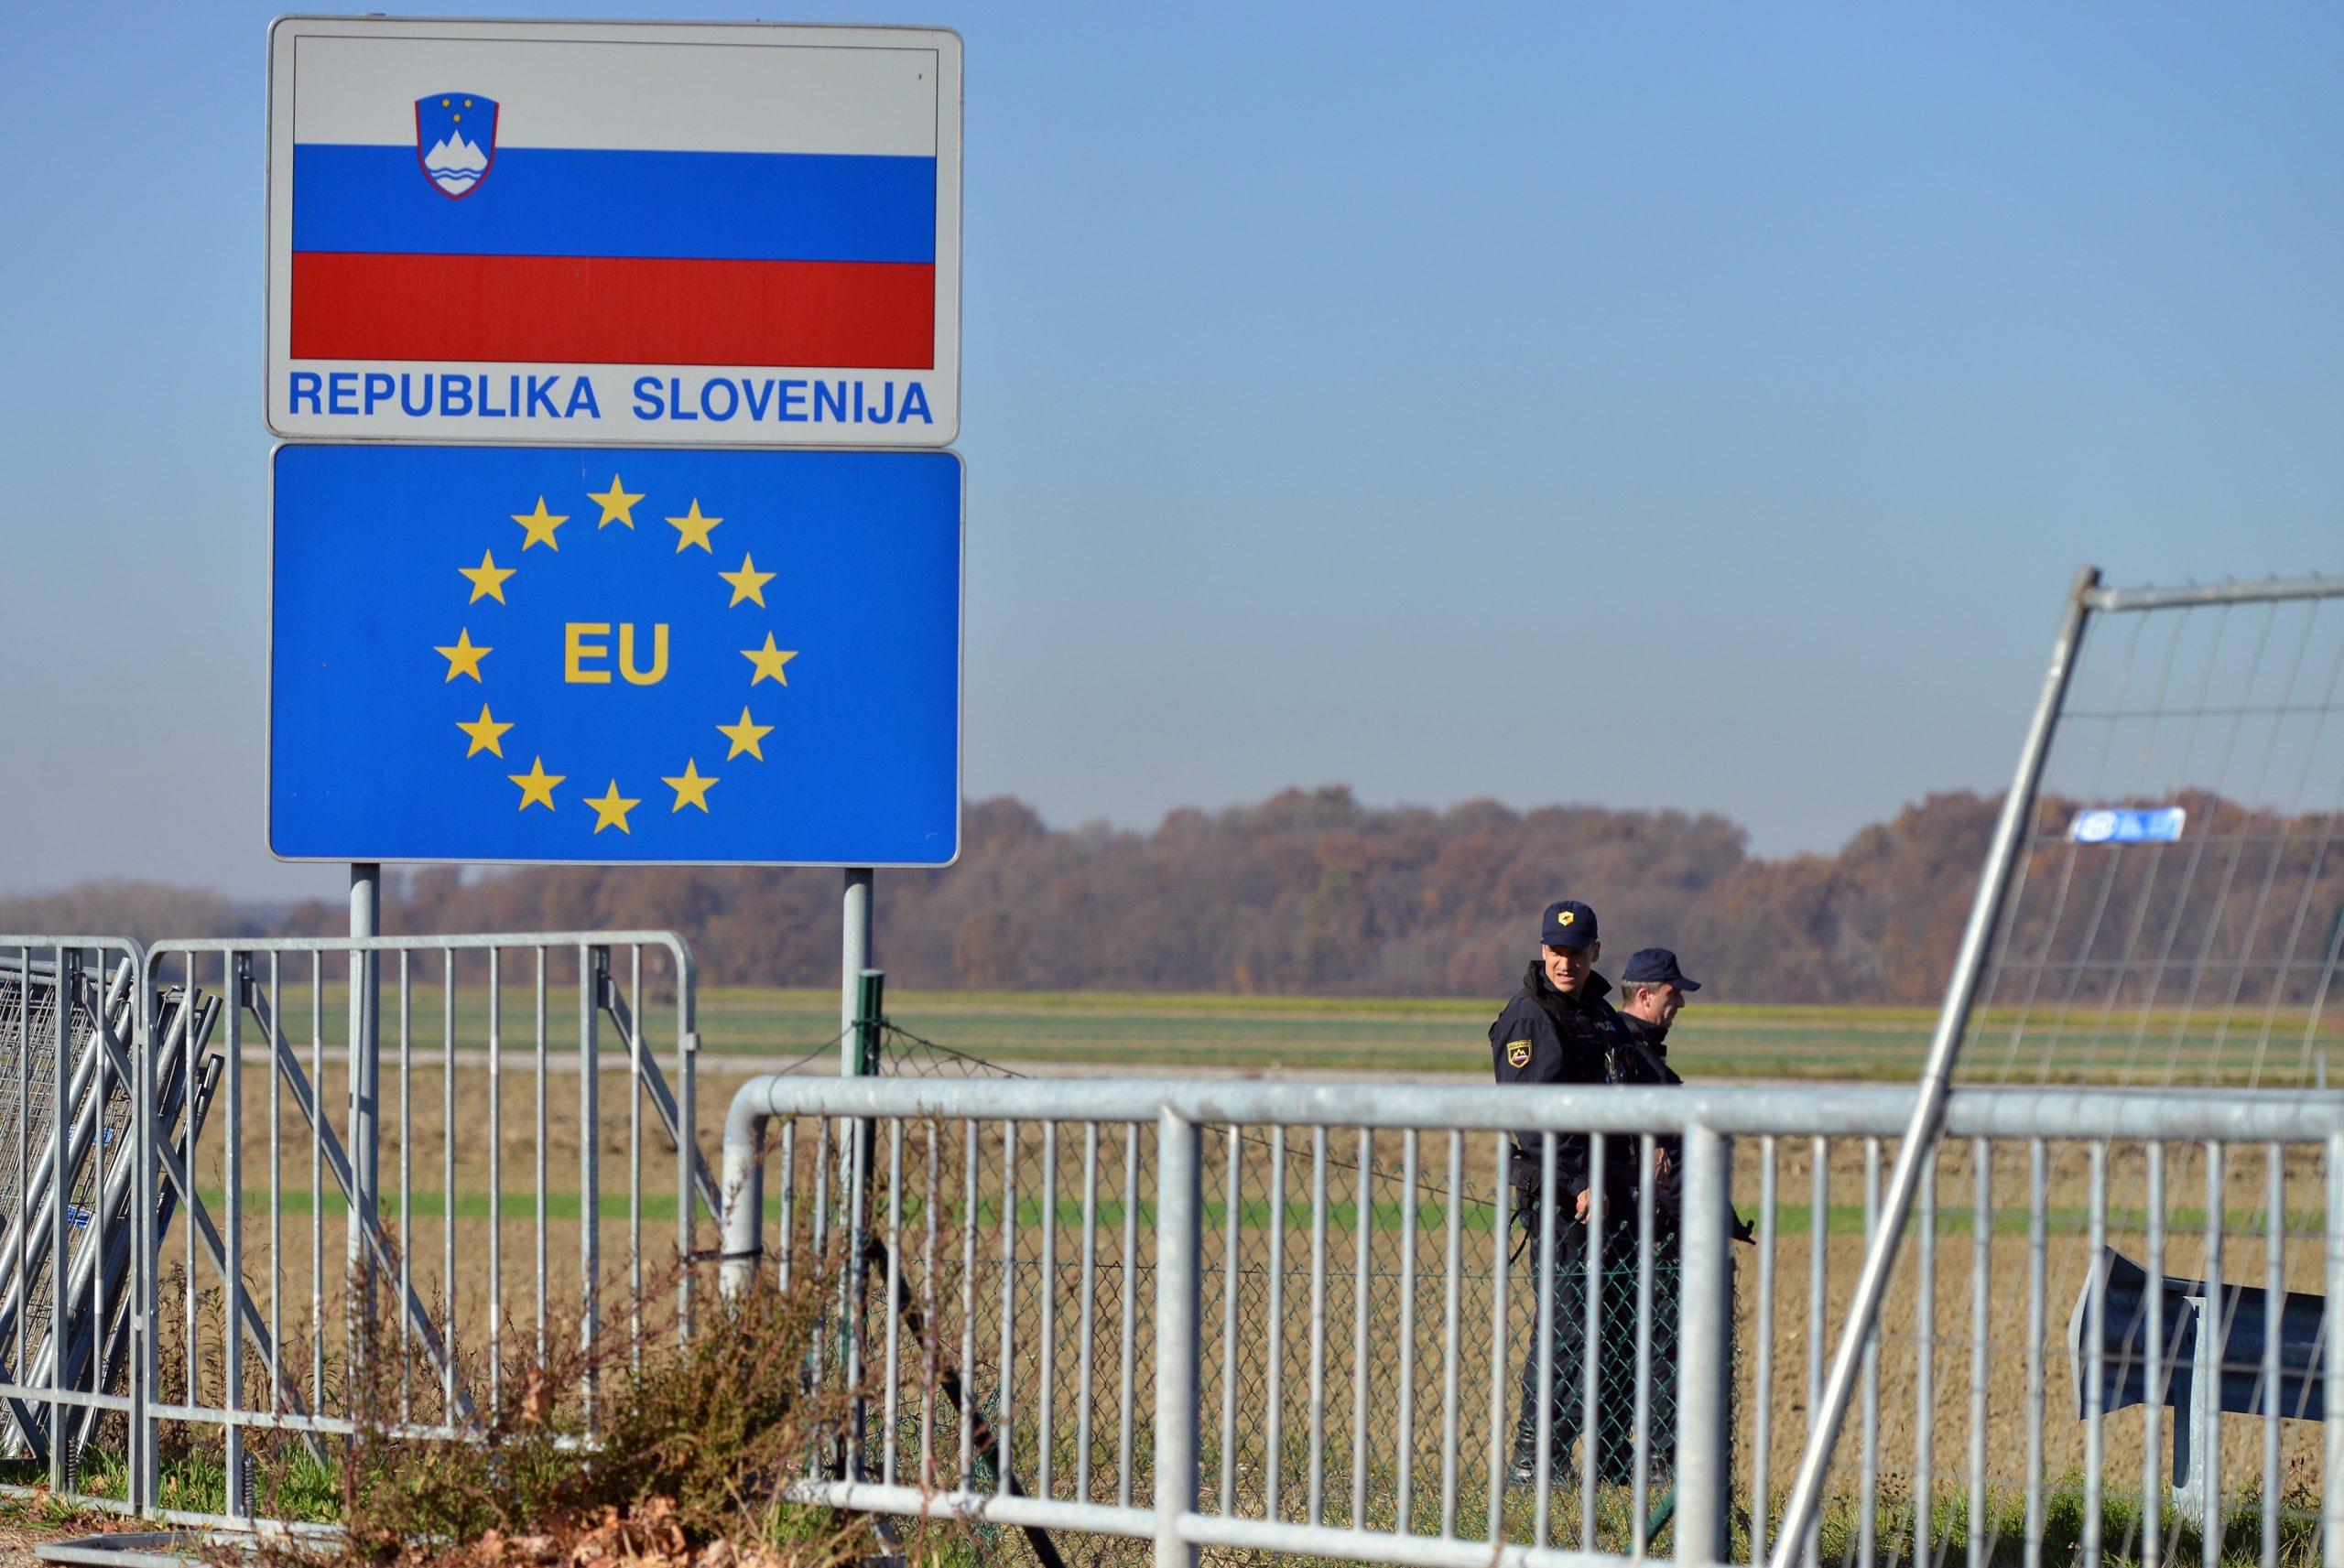 Slovensko-hrvatska granica / Foto Photo: Marko Jurinec/PIXSELL